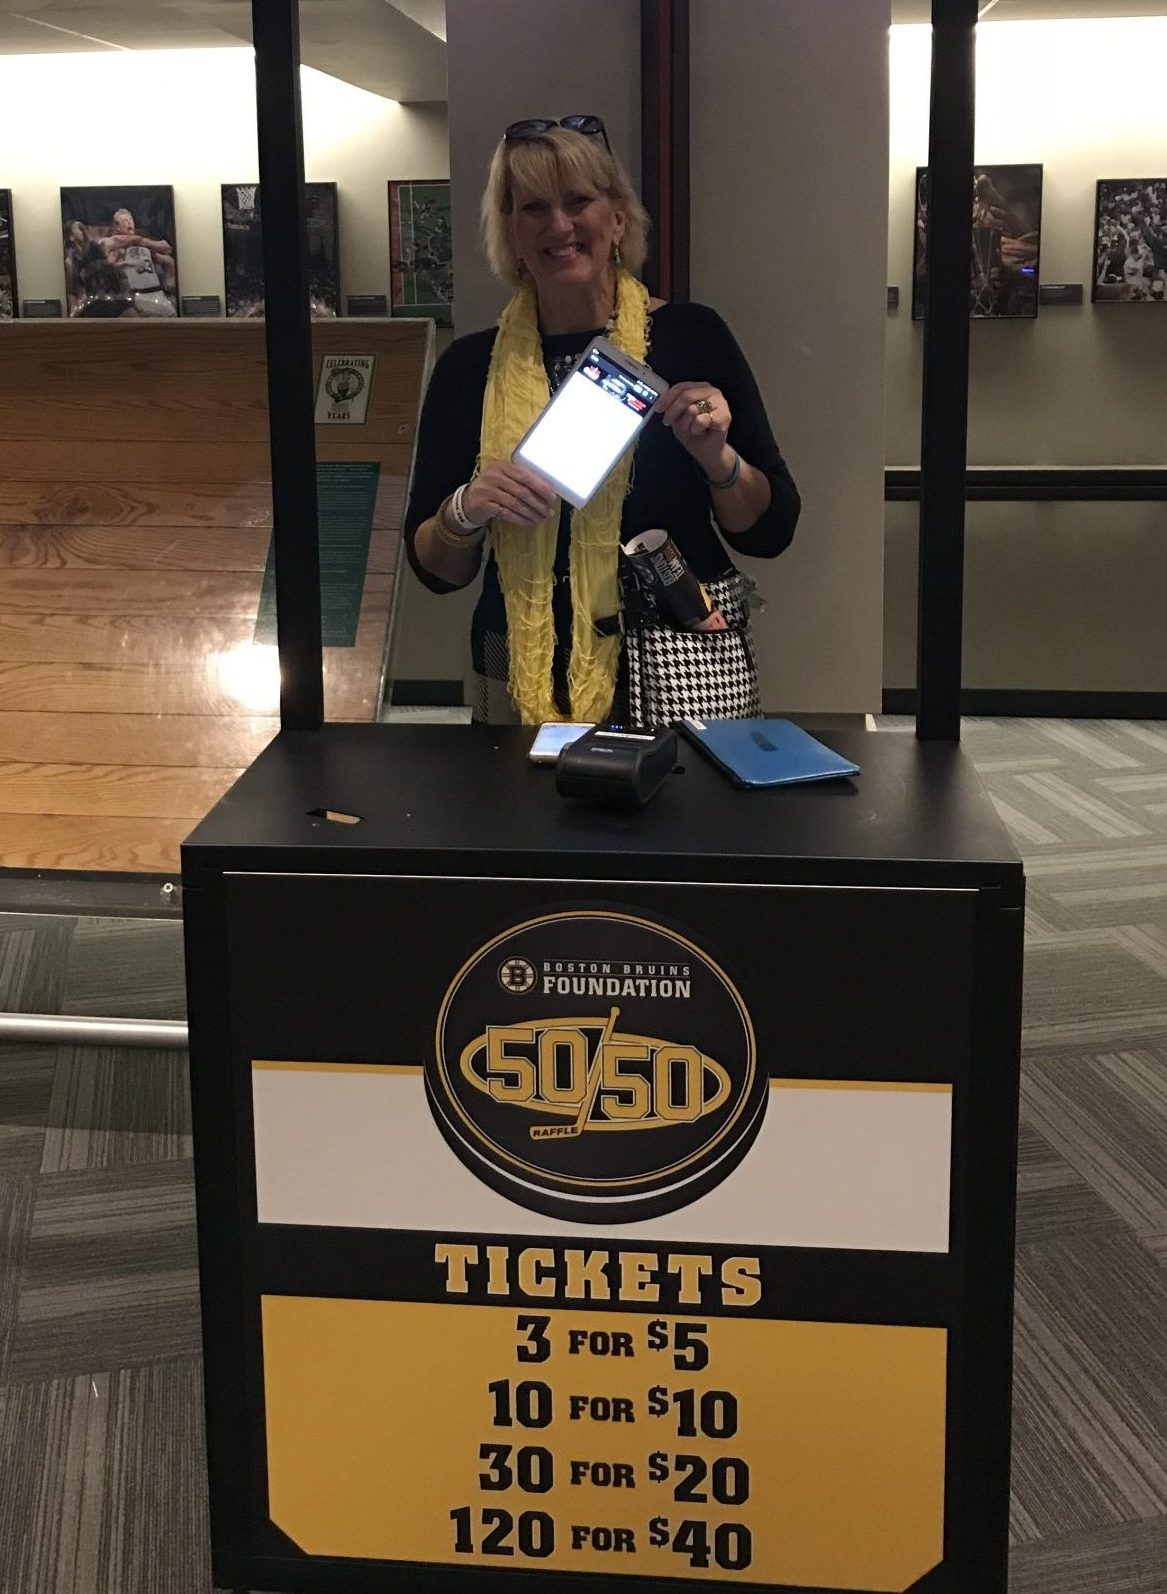 Missi Bjork at the Bruins fundraiser for FRAXA